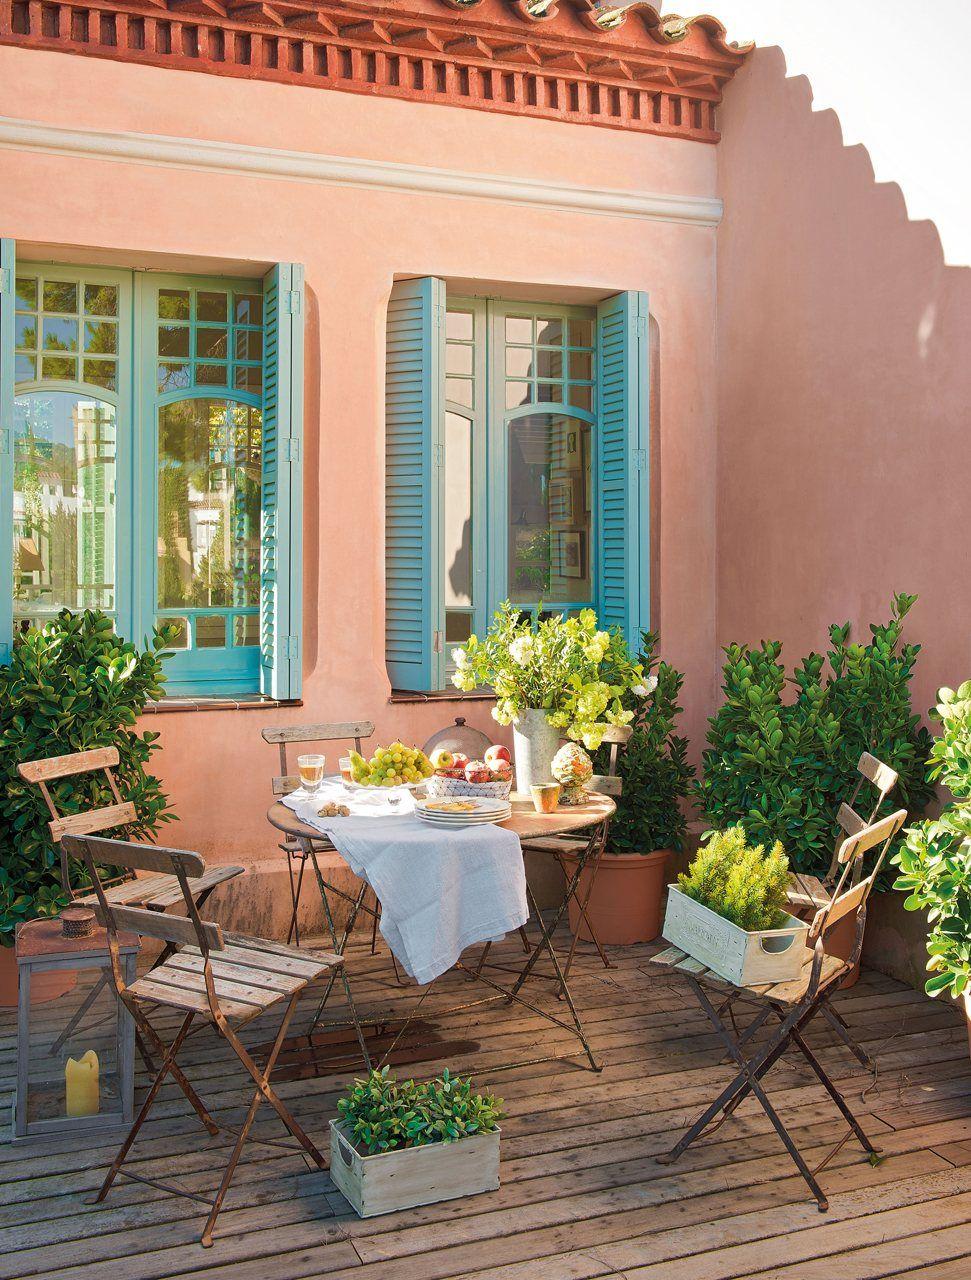 Cosas que me la esperanza del amor te gustar: Foto. Outdoor LivingSmall  Outdoor PatiosOutdoor BalconyOutdoor ...